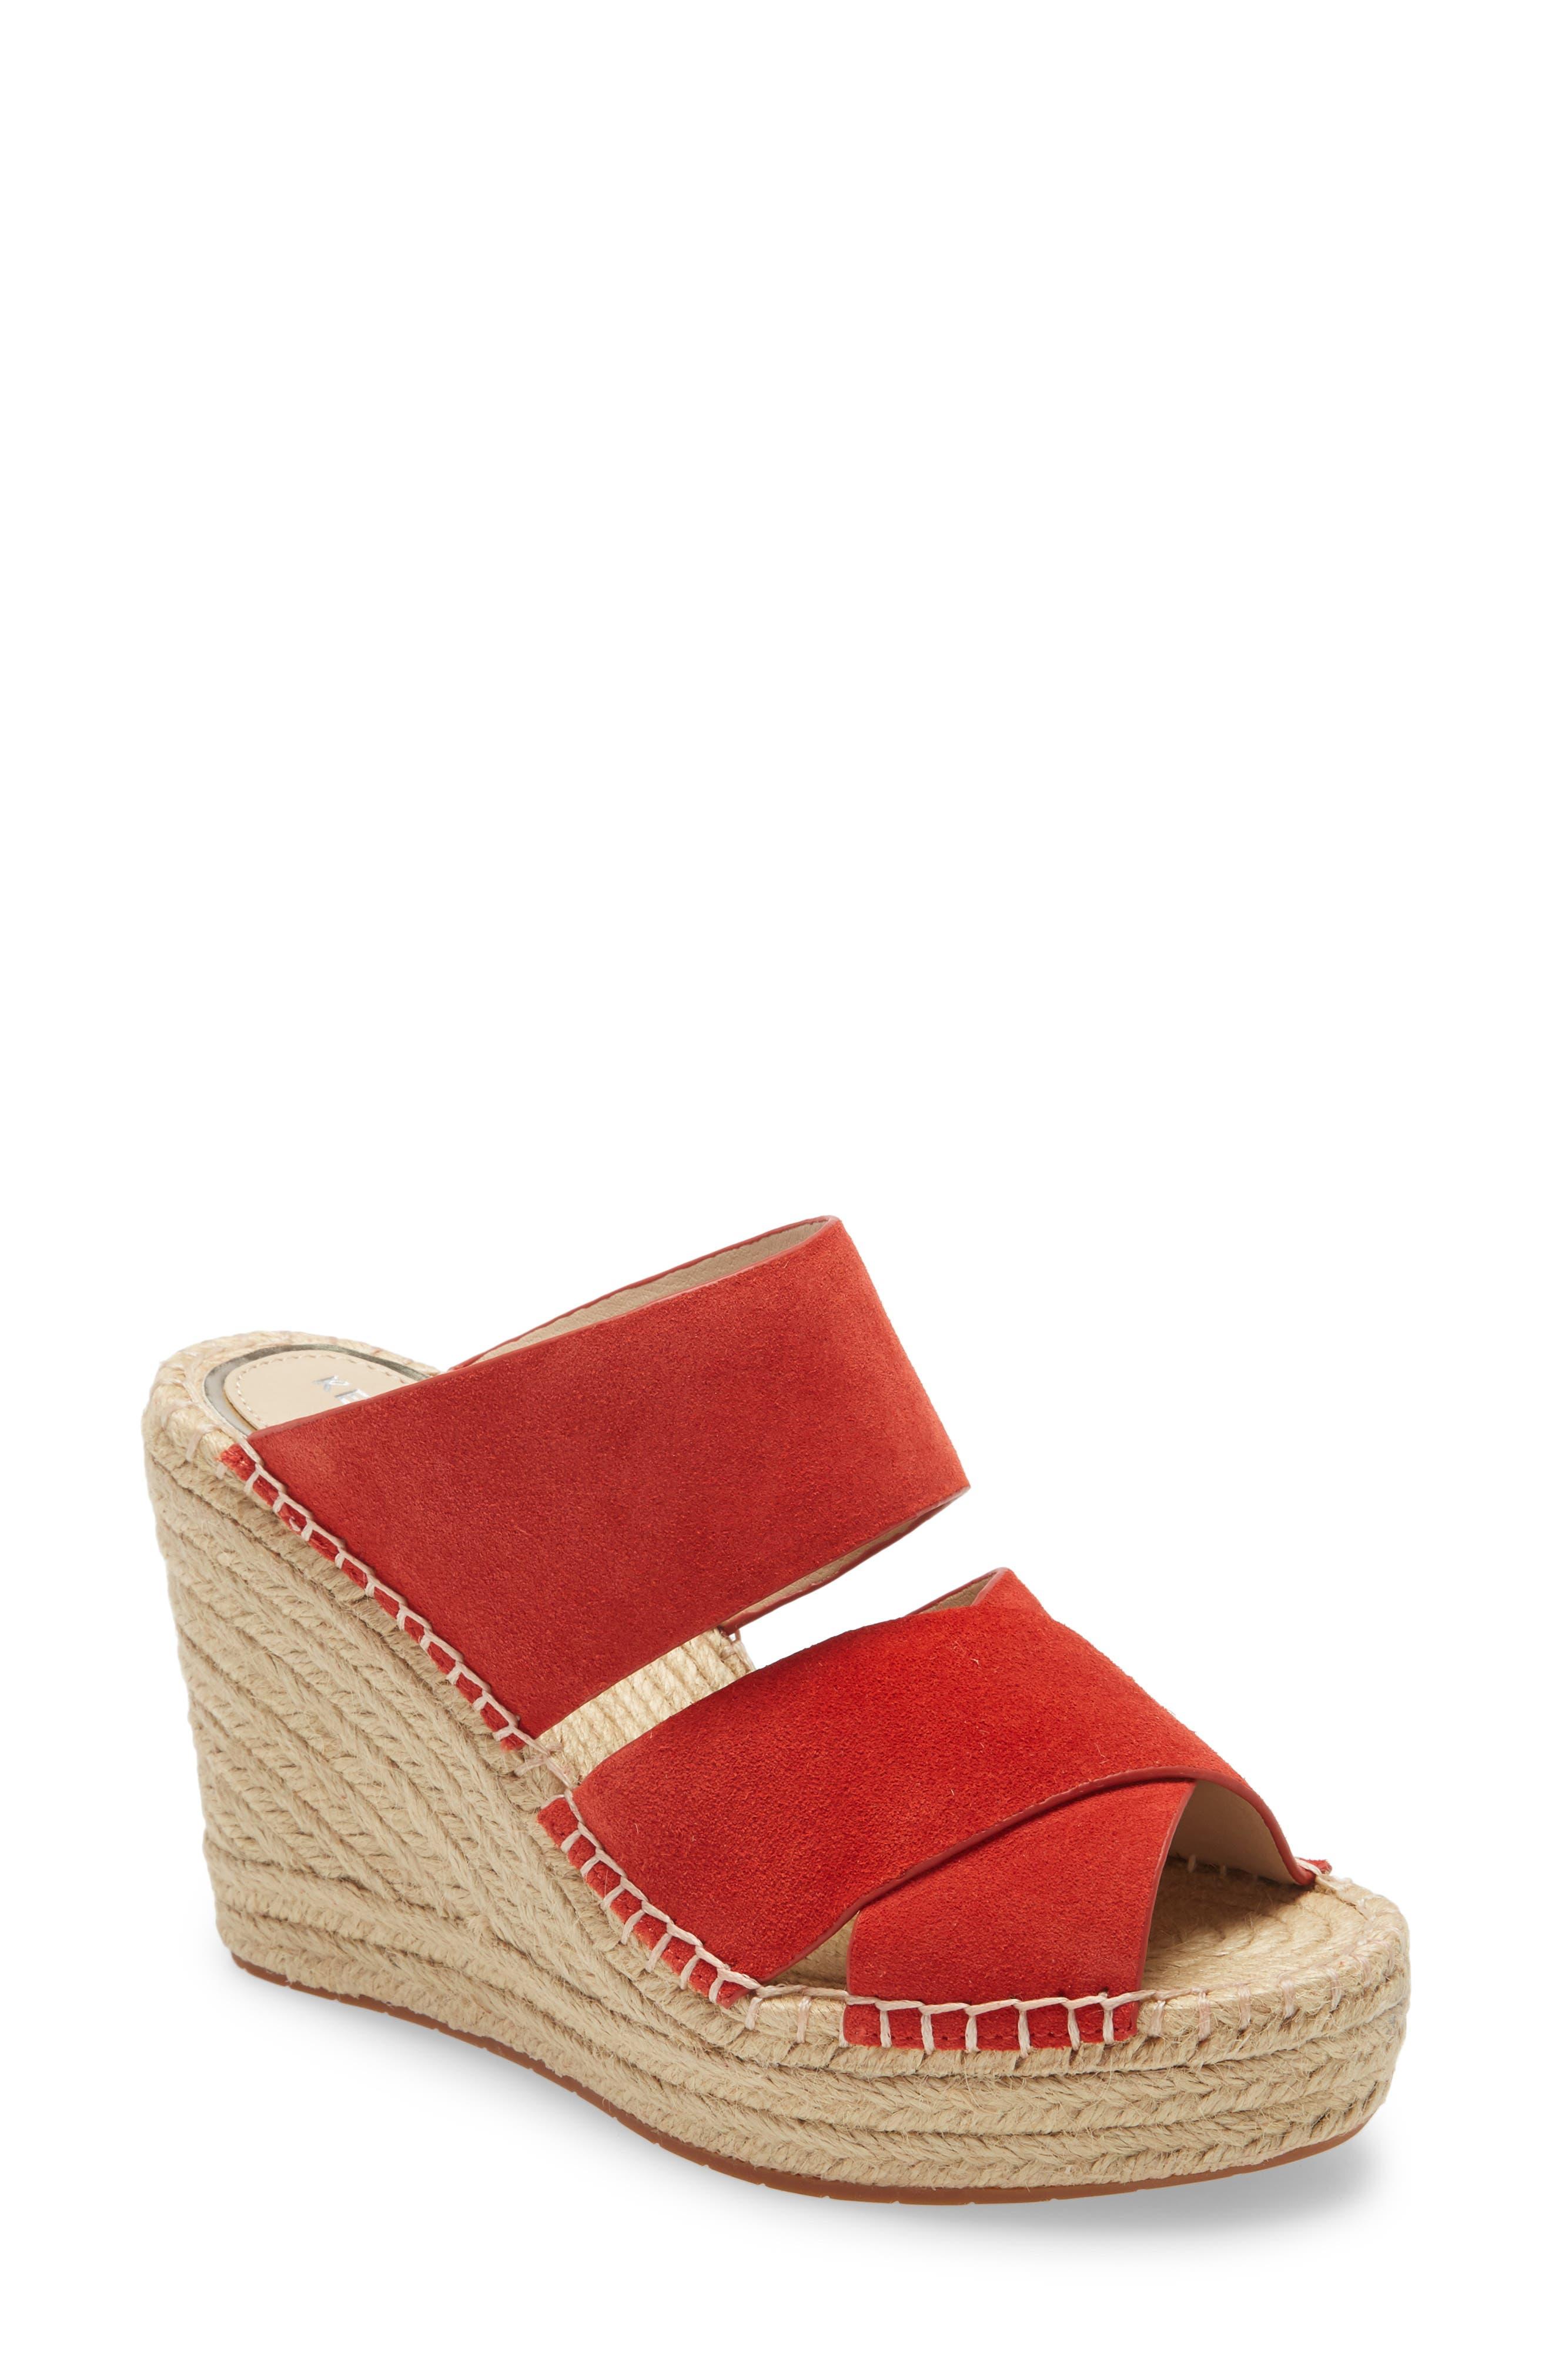 Olivia Wedge Slide Sandal